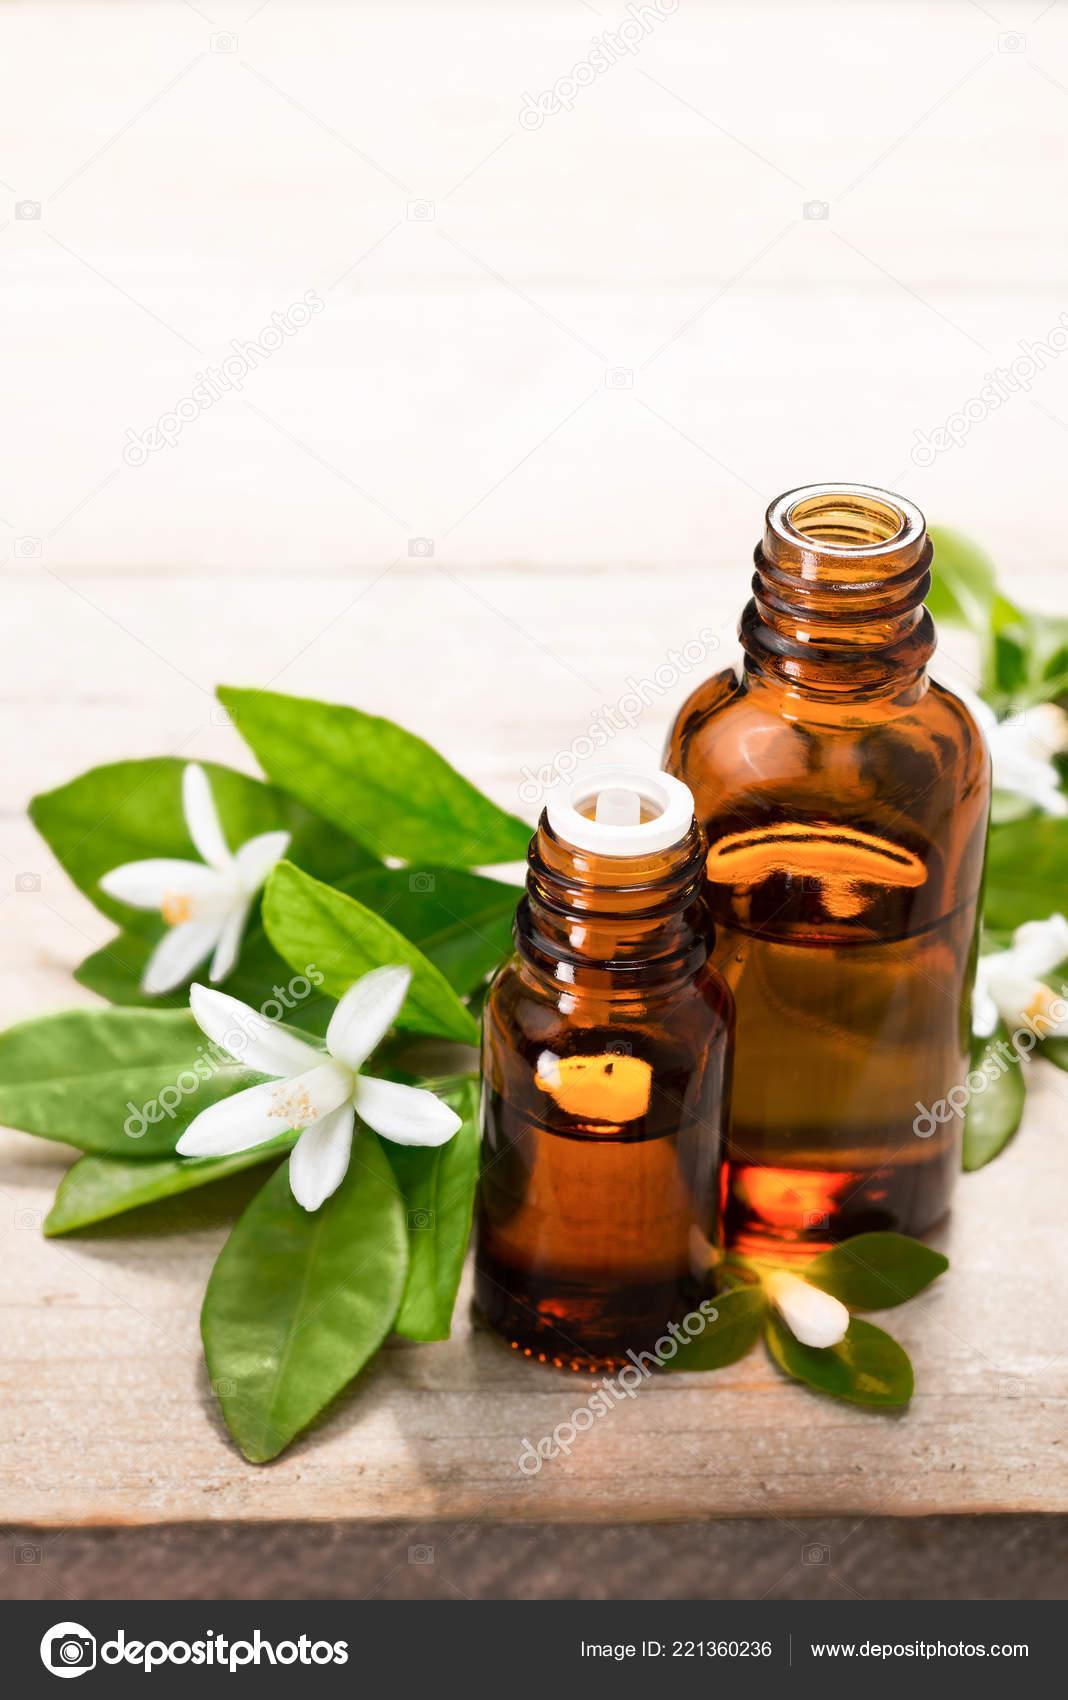 Neroli Essential Oil Brown Glass Bottle Fresh White Neroli Flower